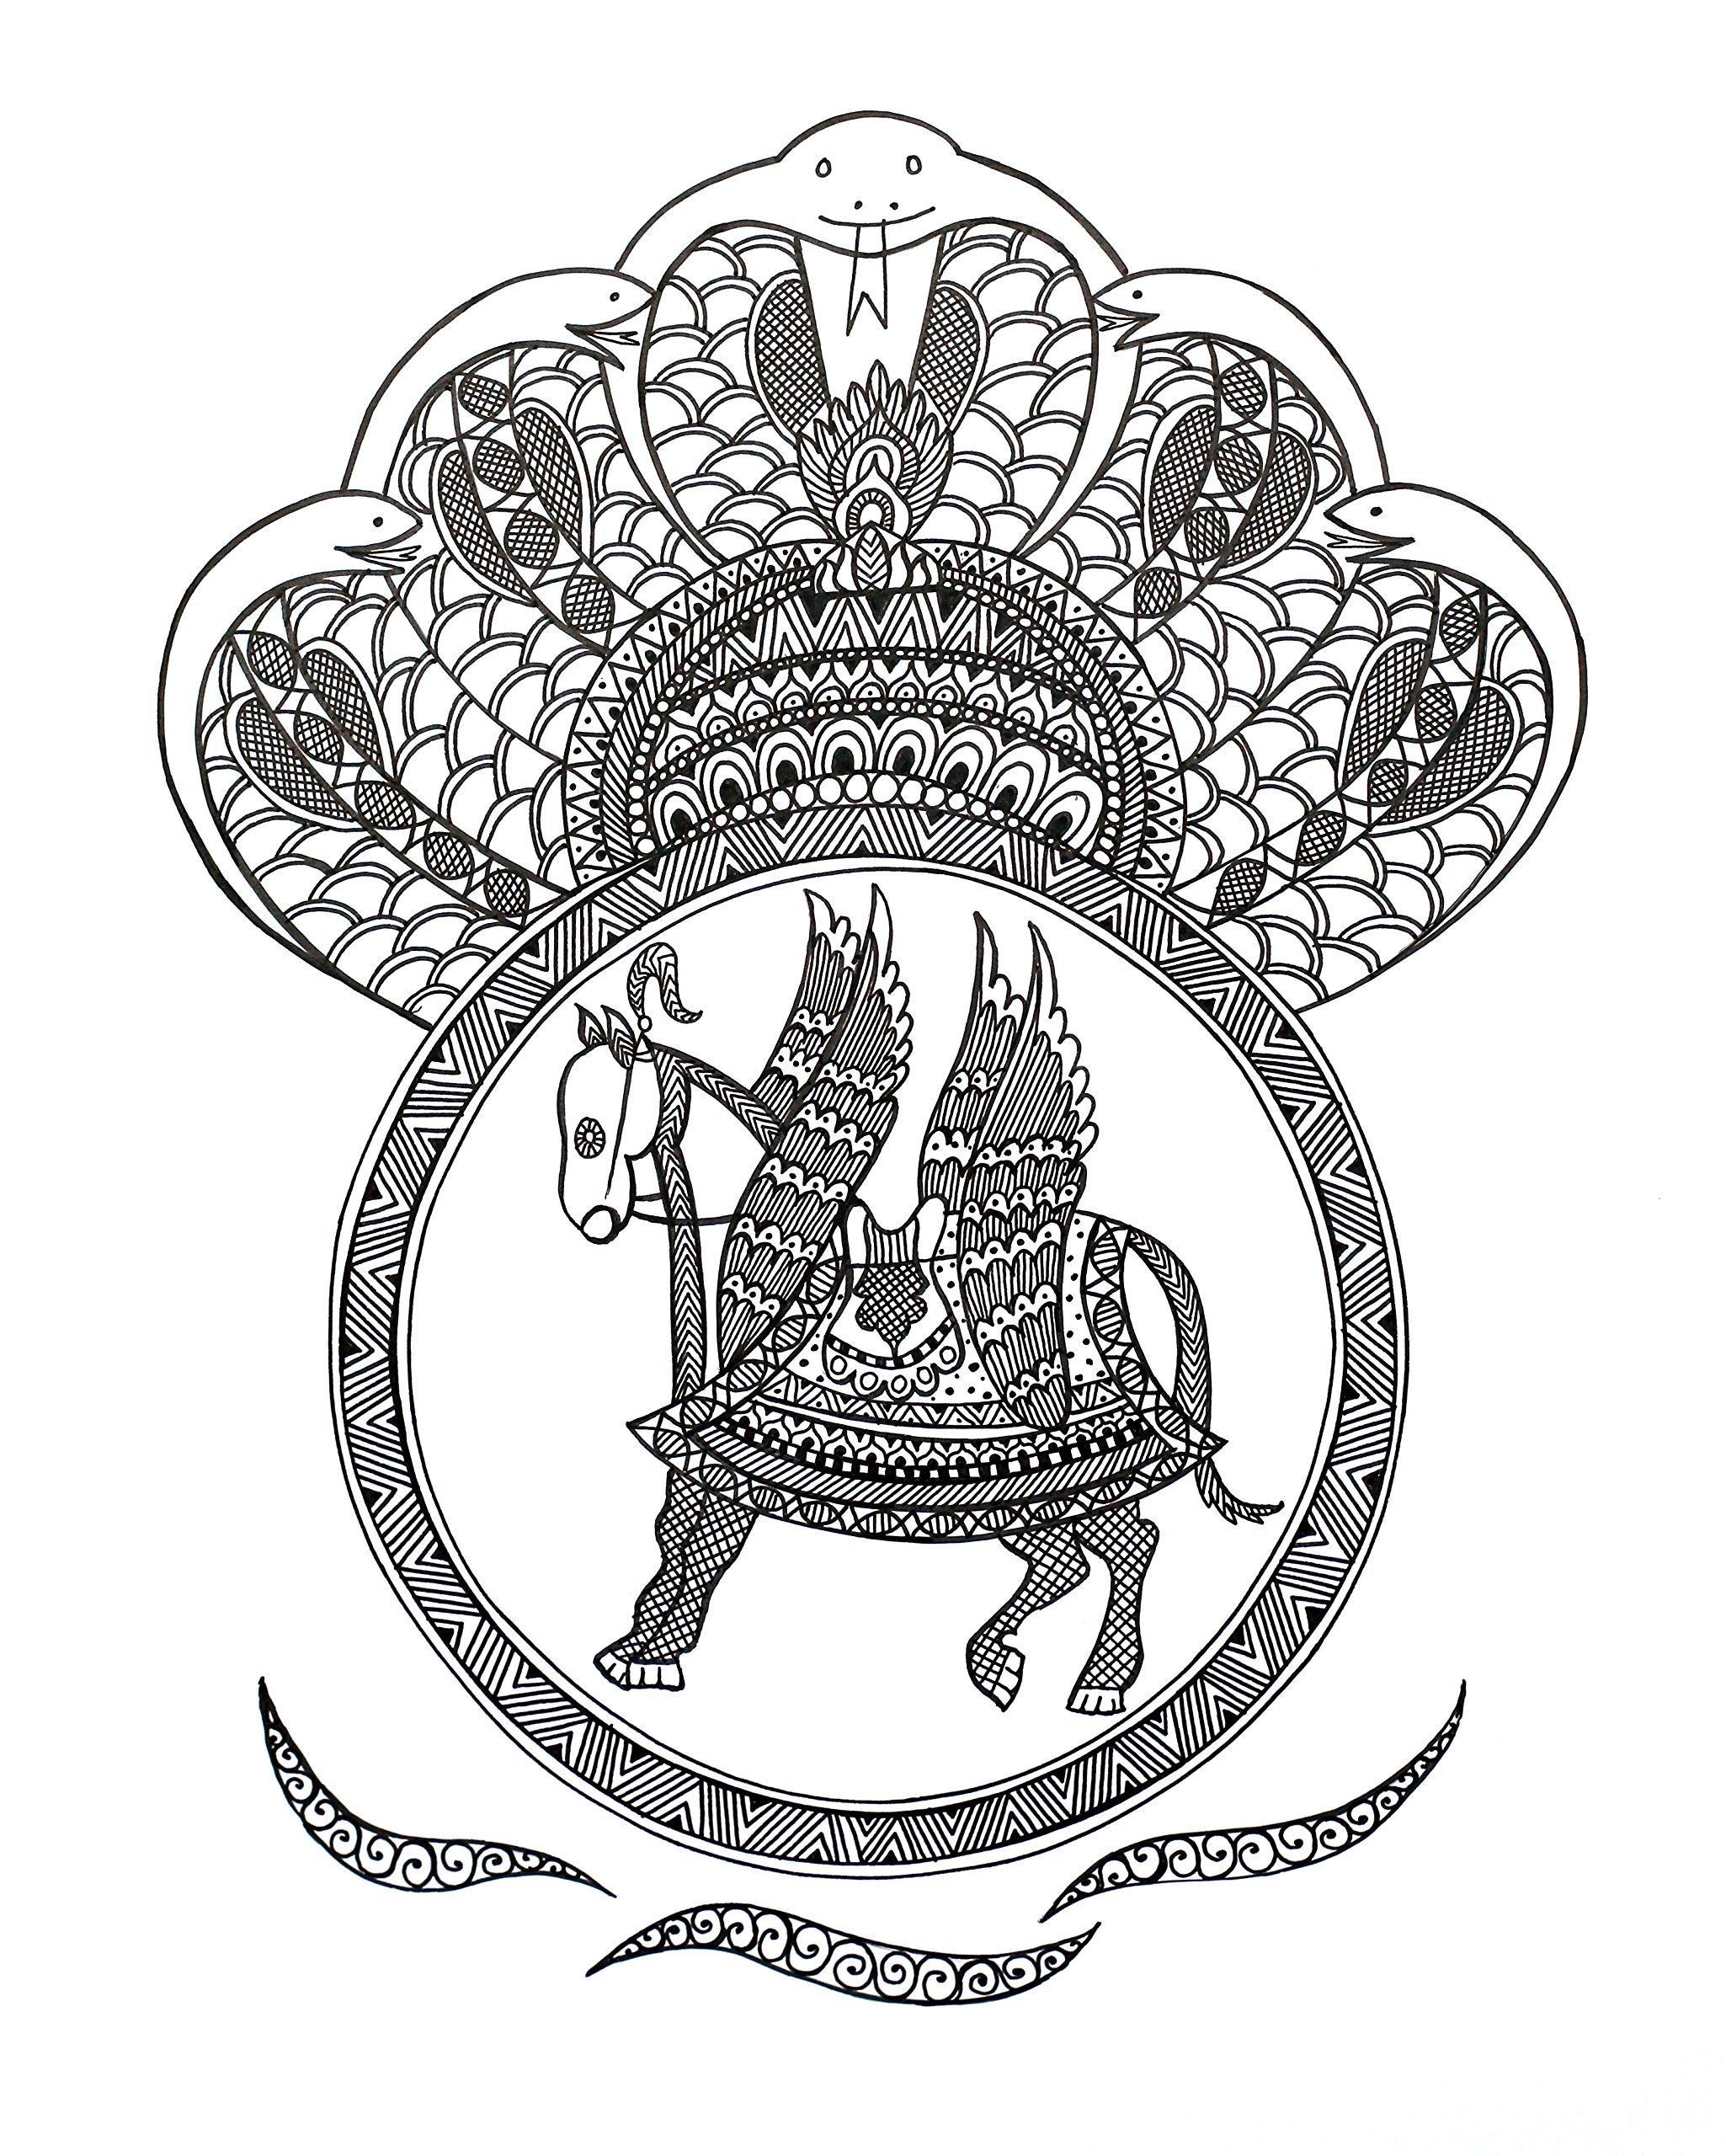 Incarnation of Lord Vishnu-Kalki by